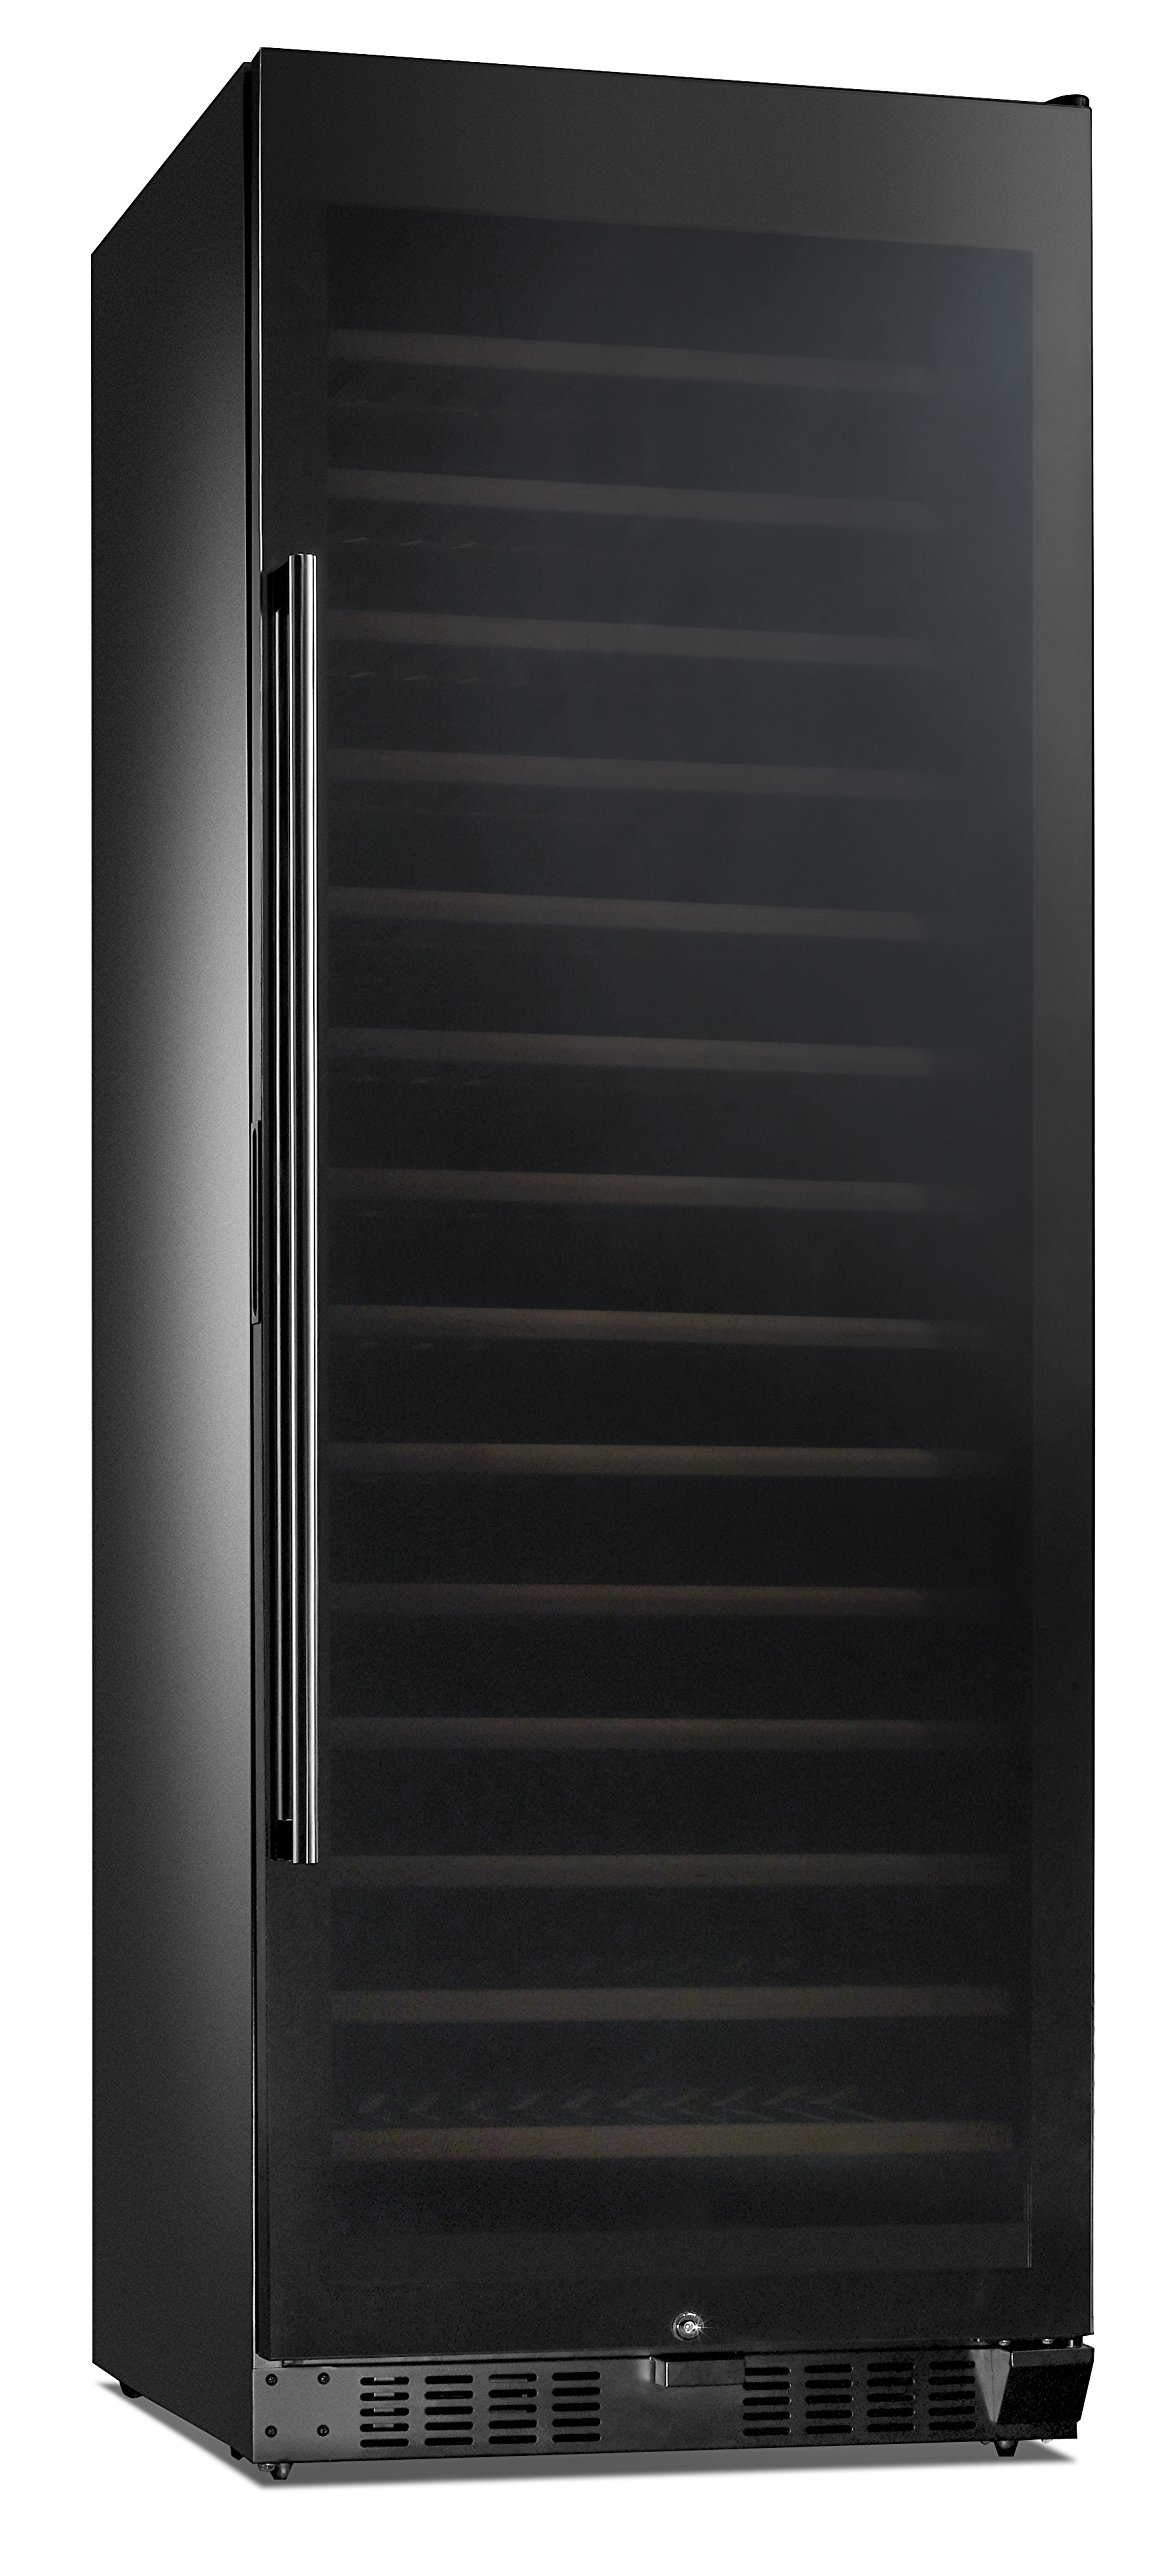 Smith & Hanks 183 Bottle Single Zone Wine Refrigerator, Stainless Steel Door, Built-In or Free Standing, Professional Series